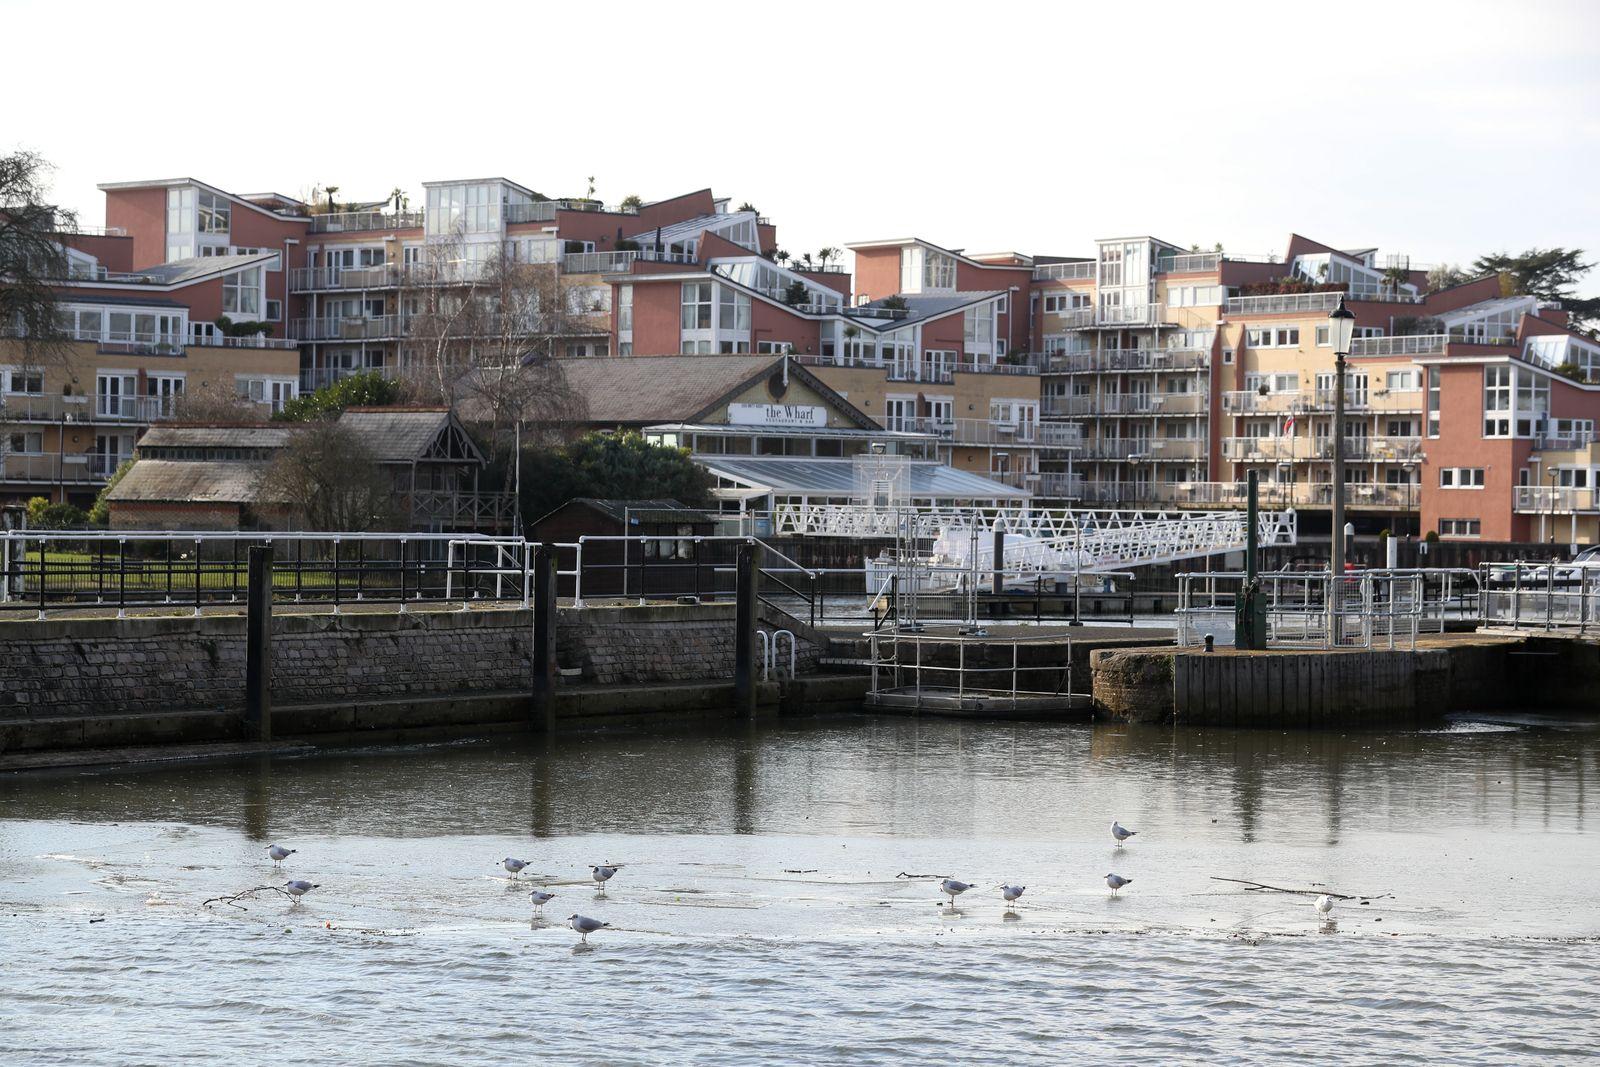 The River Thames Freezes, UK Weather, Teddington, London, UK - 12 Feb 2021